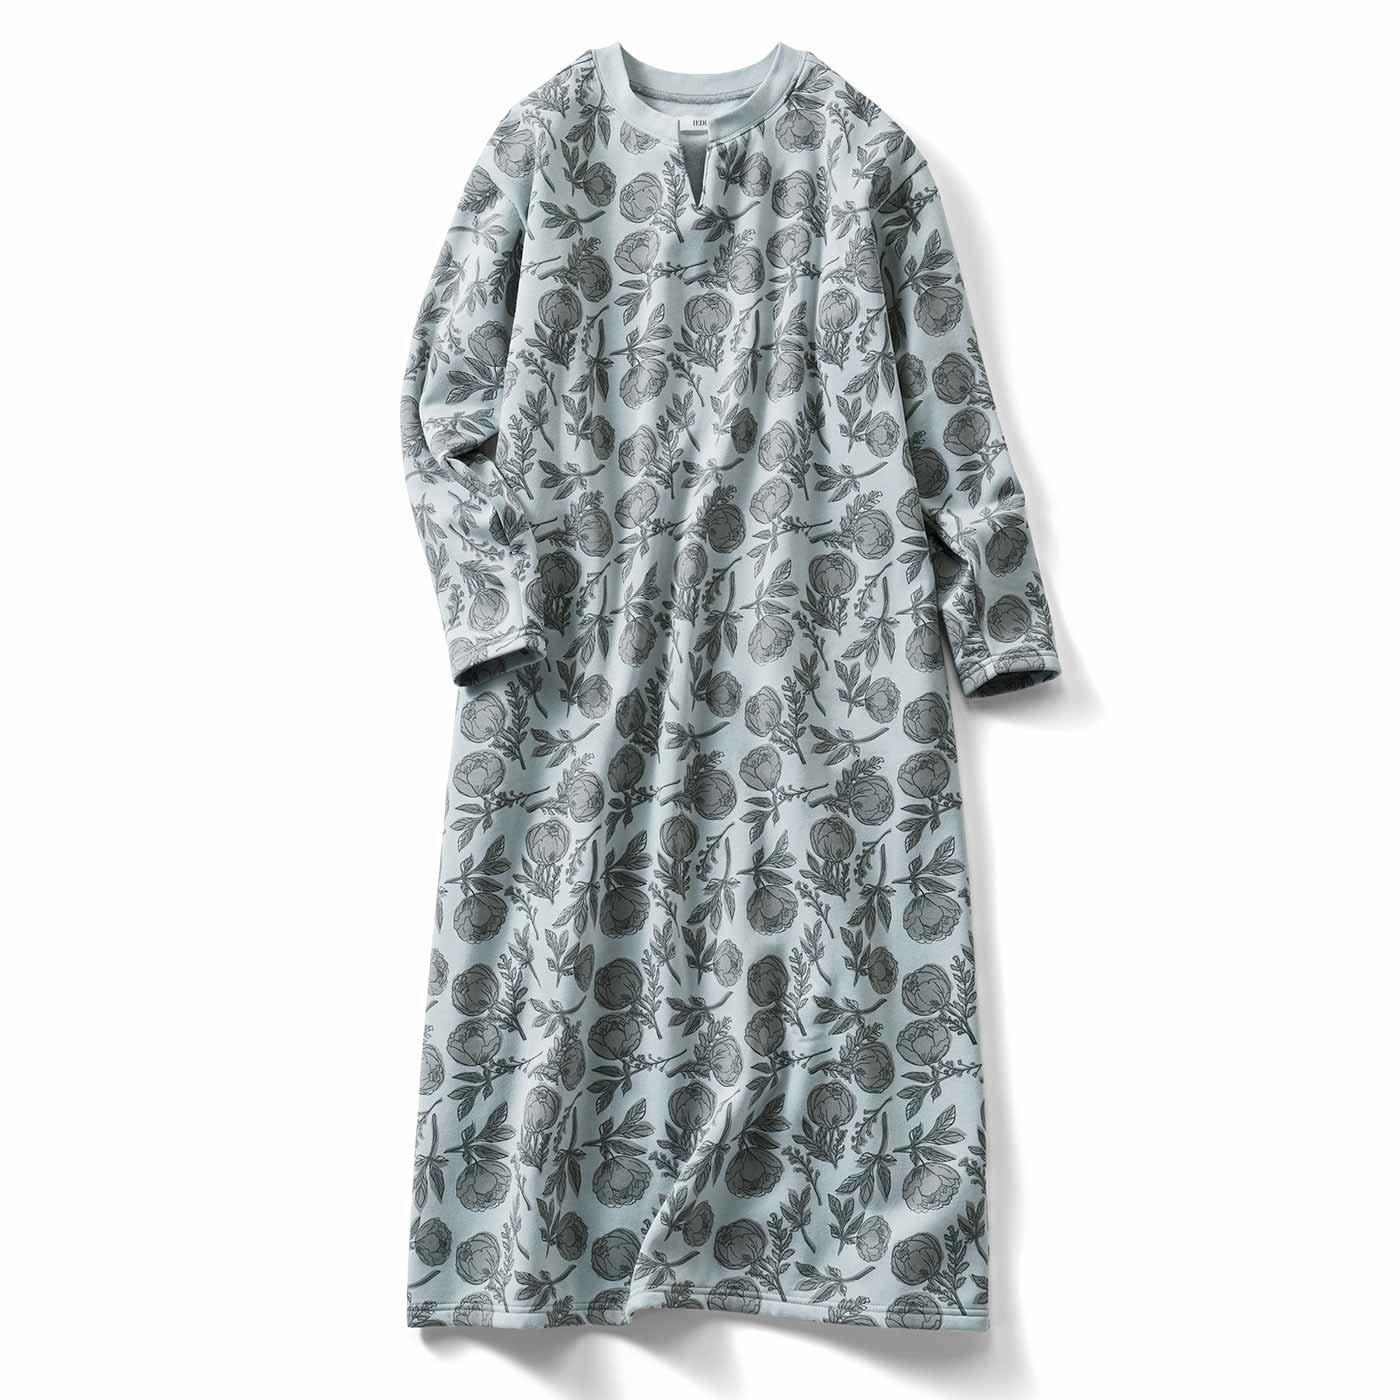 IEDIT[イディット] 内側微起毛のボタニカルプリントホームドレス〈グレイッシュブルー〉